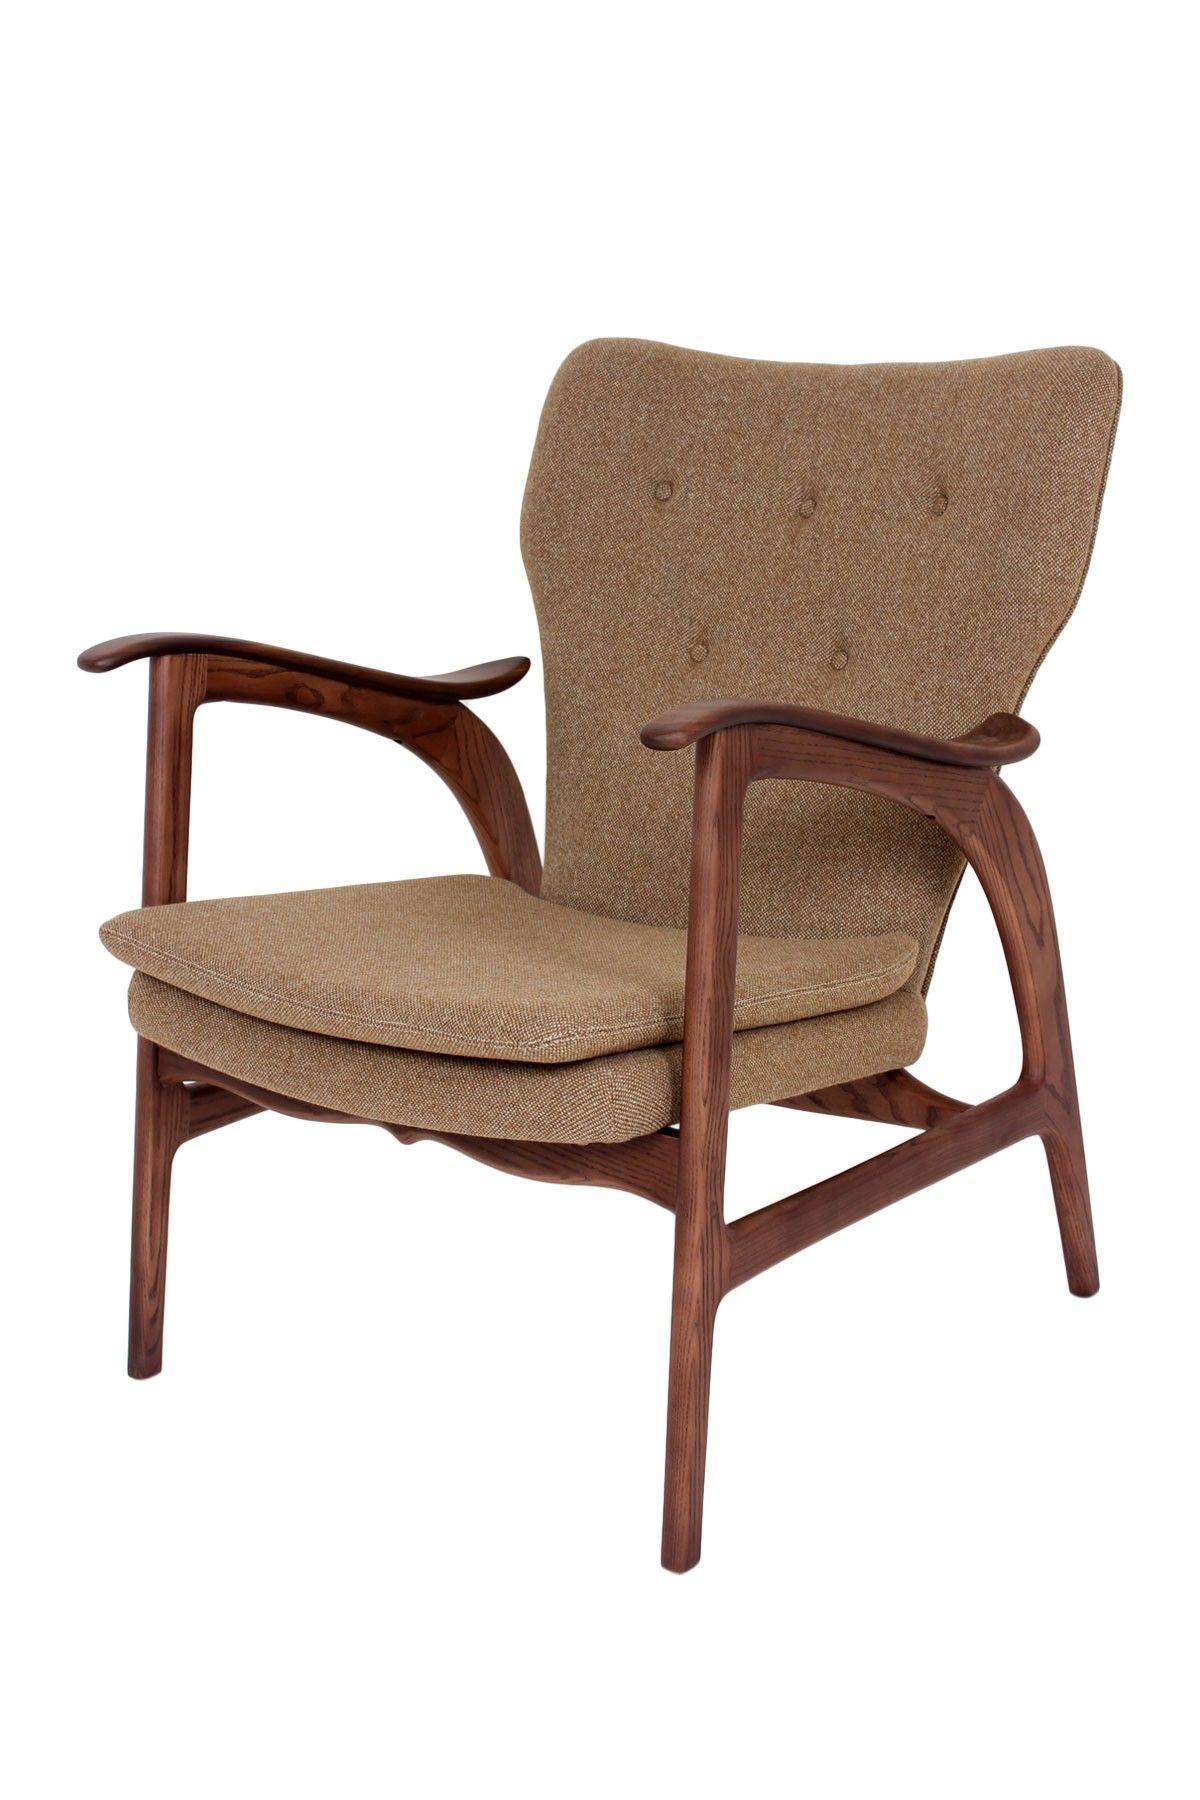 Control Brand Franz Brown Chair Modern Style Furniture Brown Chair Mid Century Style Furniture